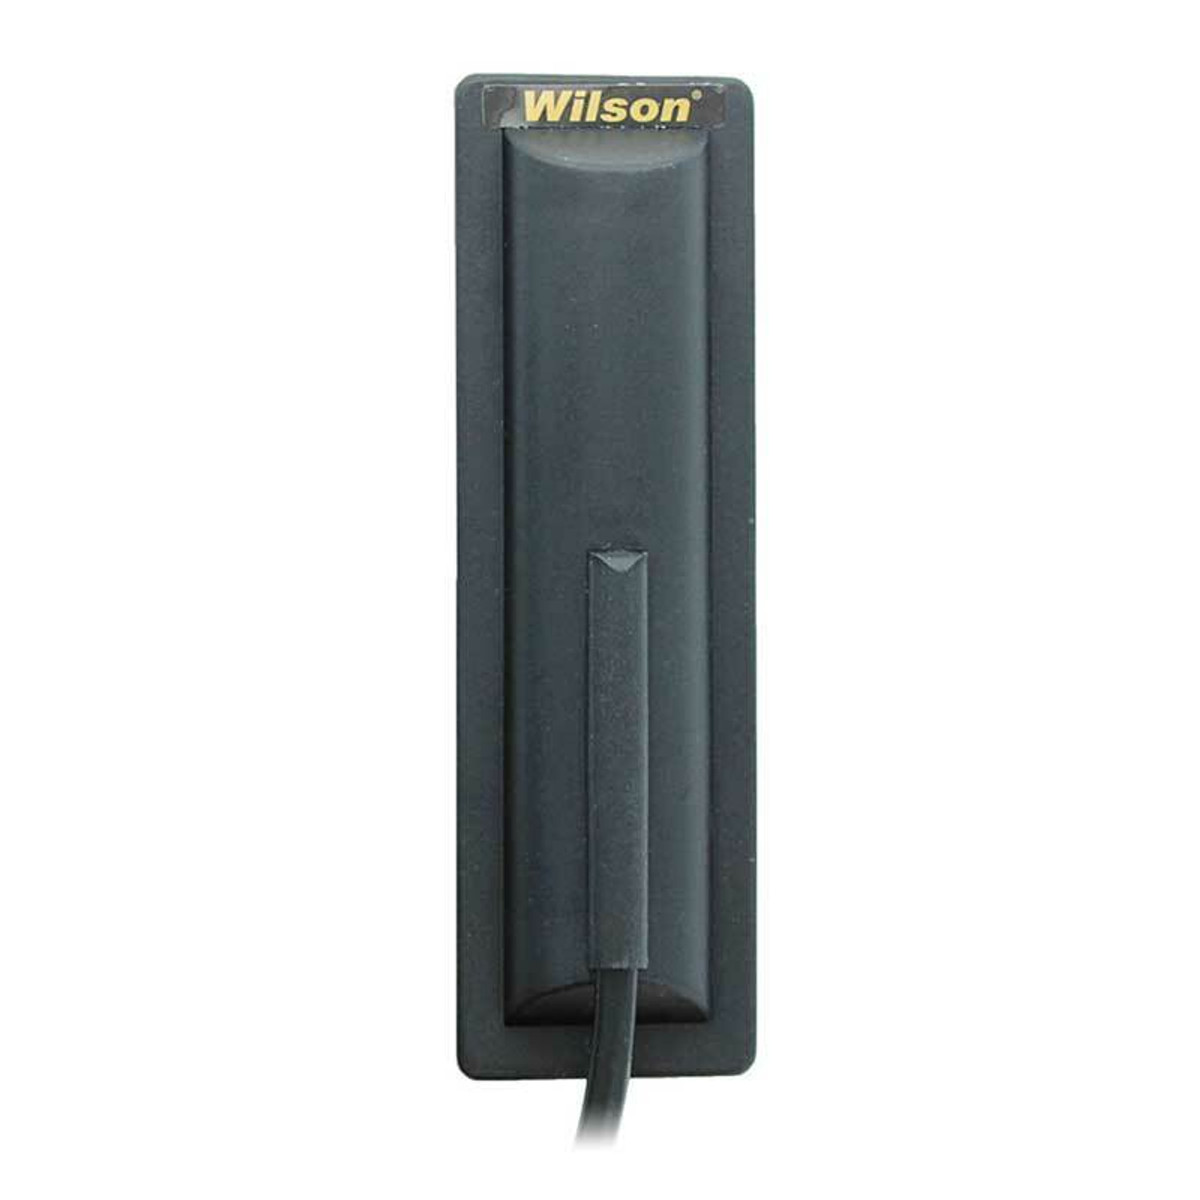 weBoost (Wilson) Low Profile Antenna SMA - 311106